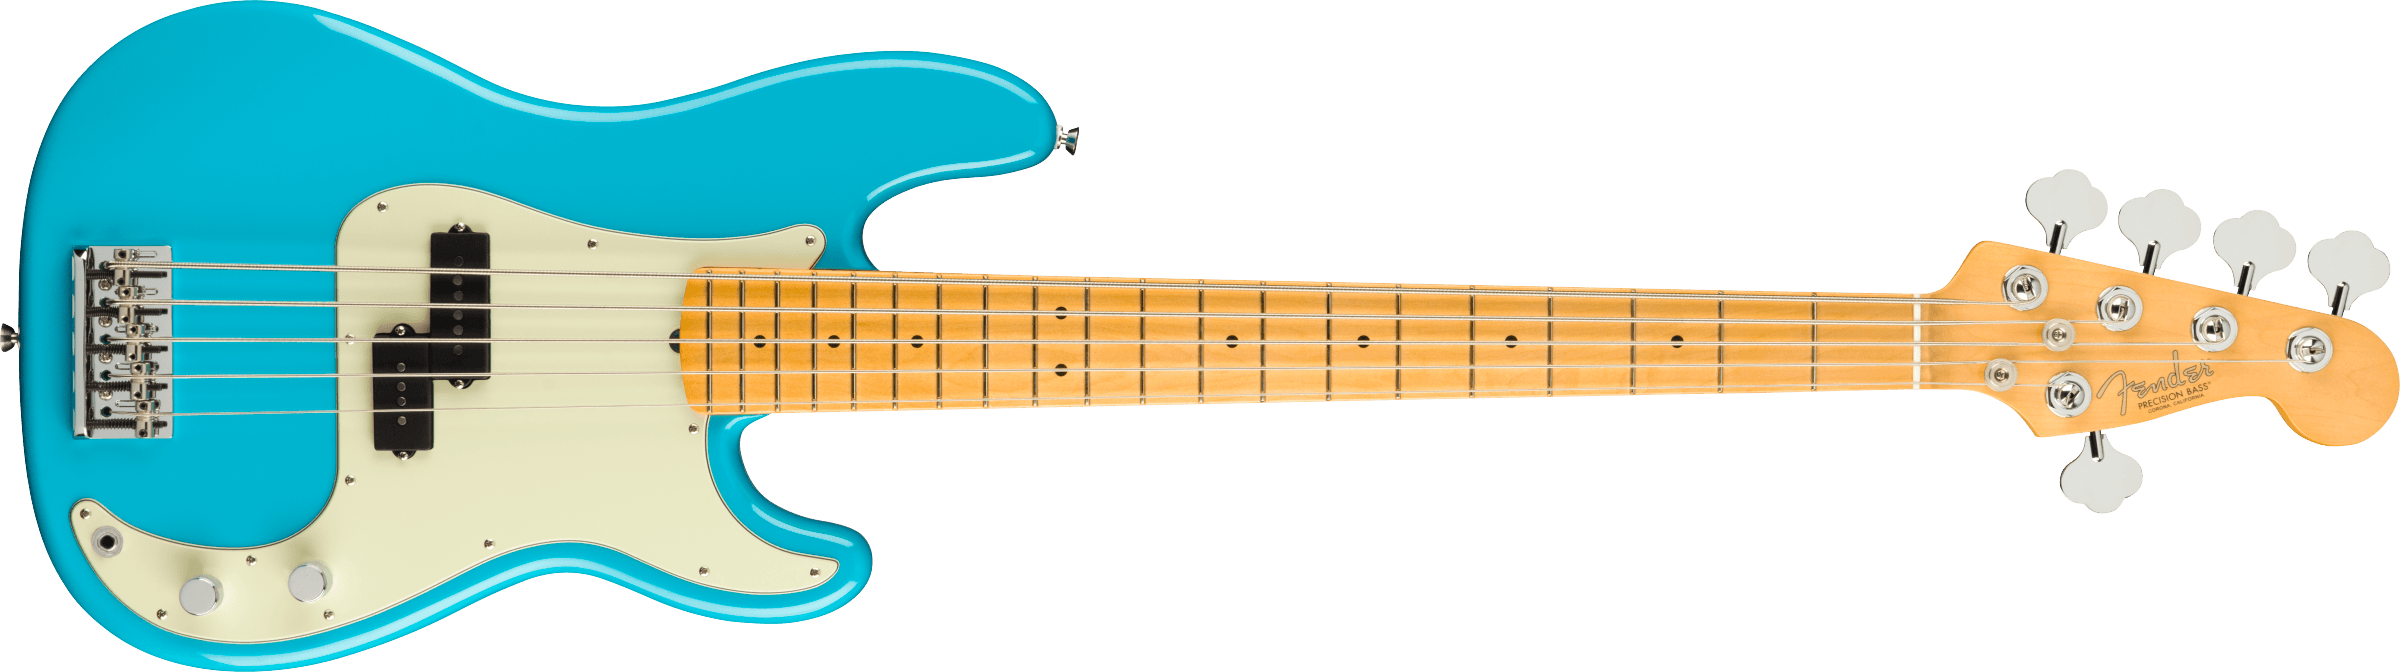 FENDER-American-Professional-II-Precision-Bass-V-Maple-Fingerboard-Miami-Blue-sku-571005302